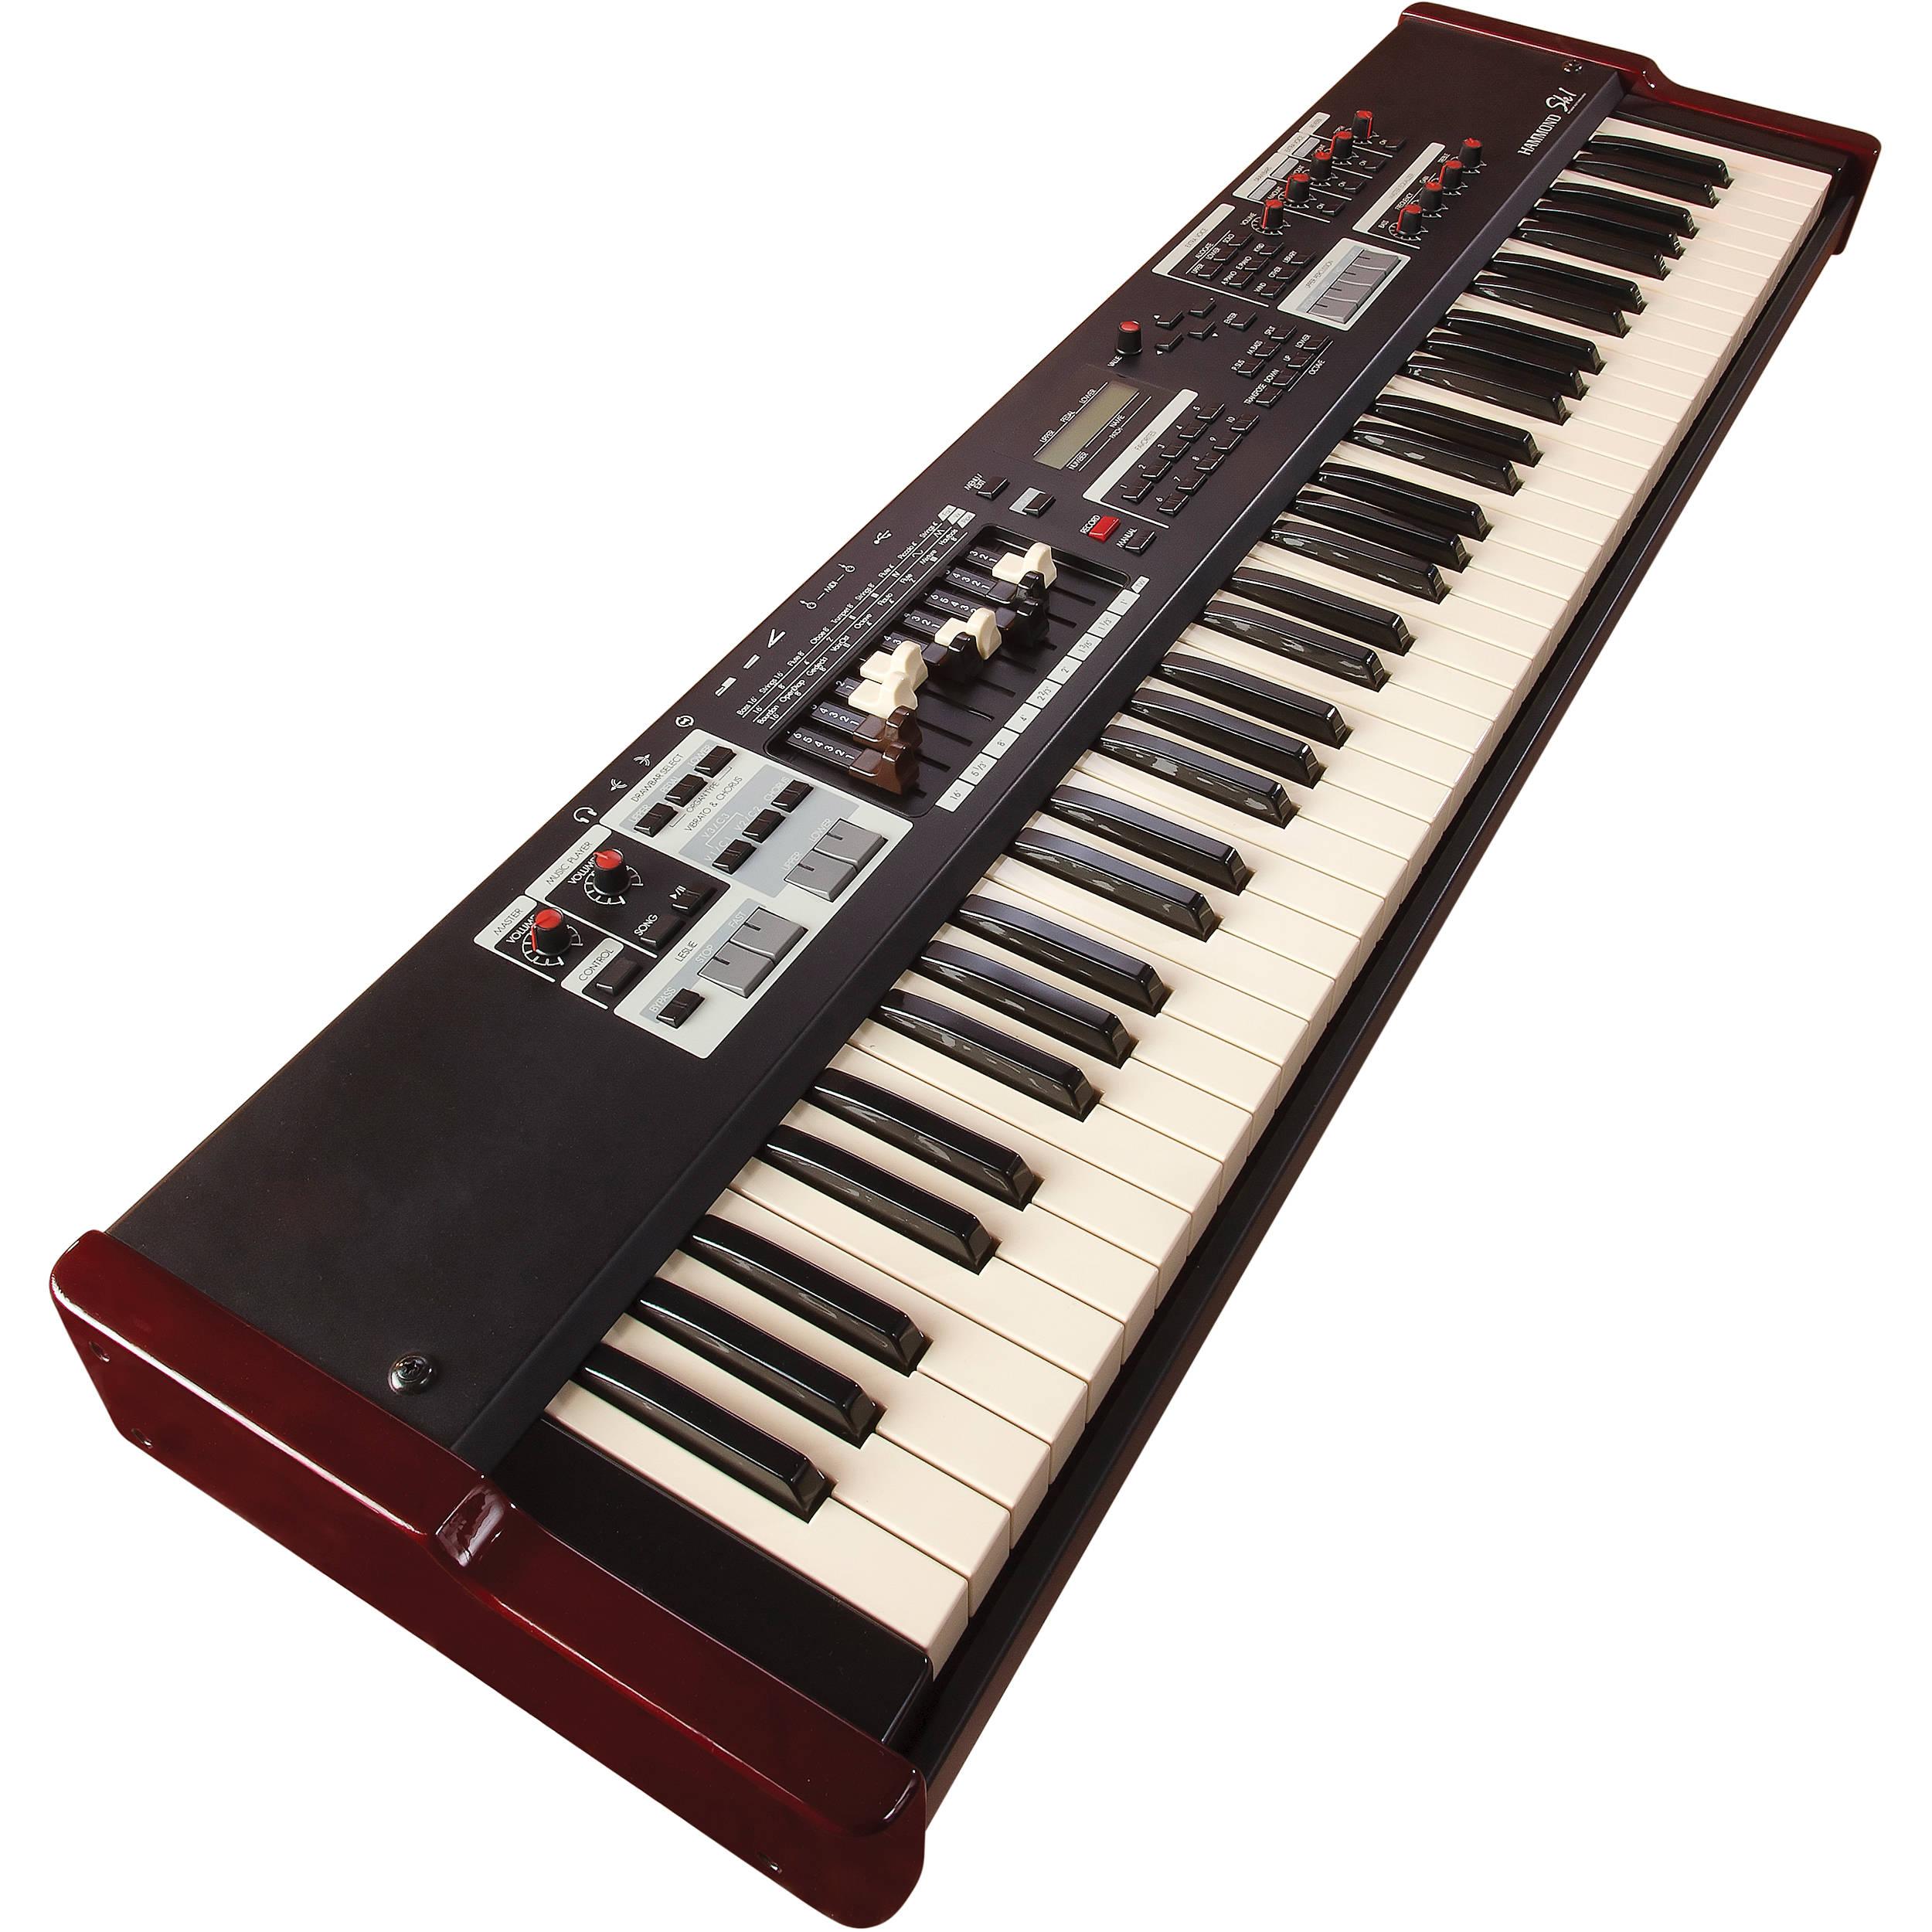 hammond sk1 73 portable hammond organ and stage keyboard. Black Bedroom Furniture Sets. Home Design Ideas